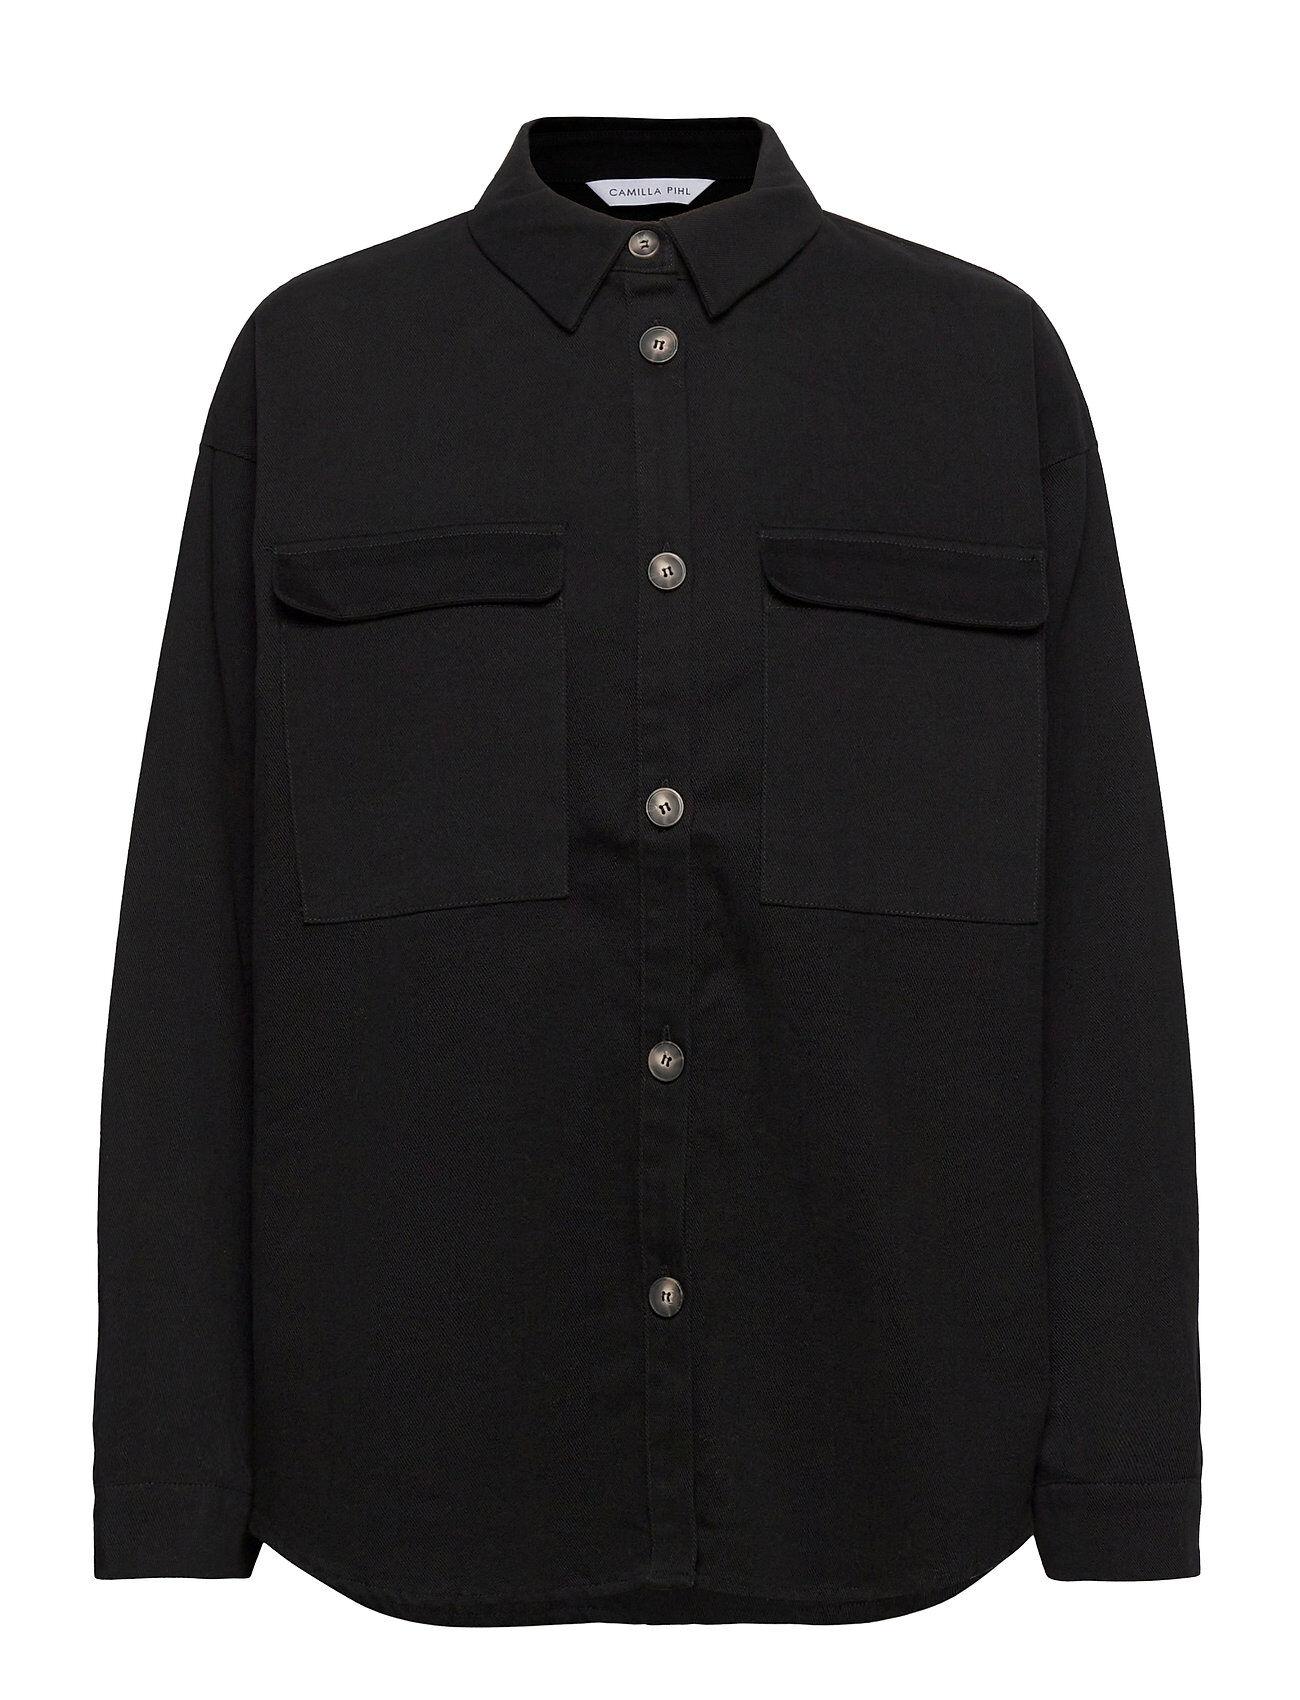 Camilla Pihl Sylvia Shirt Overshirts Musta Camilla Pihl